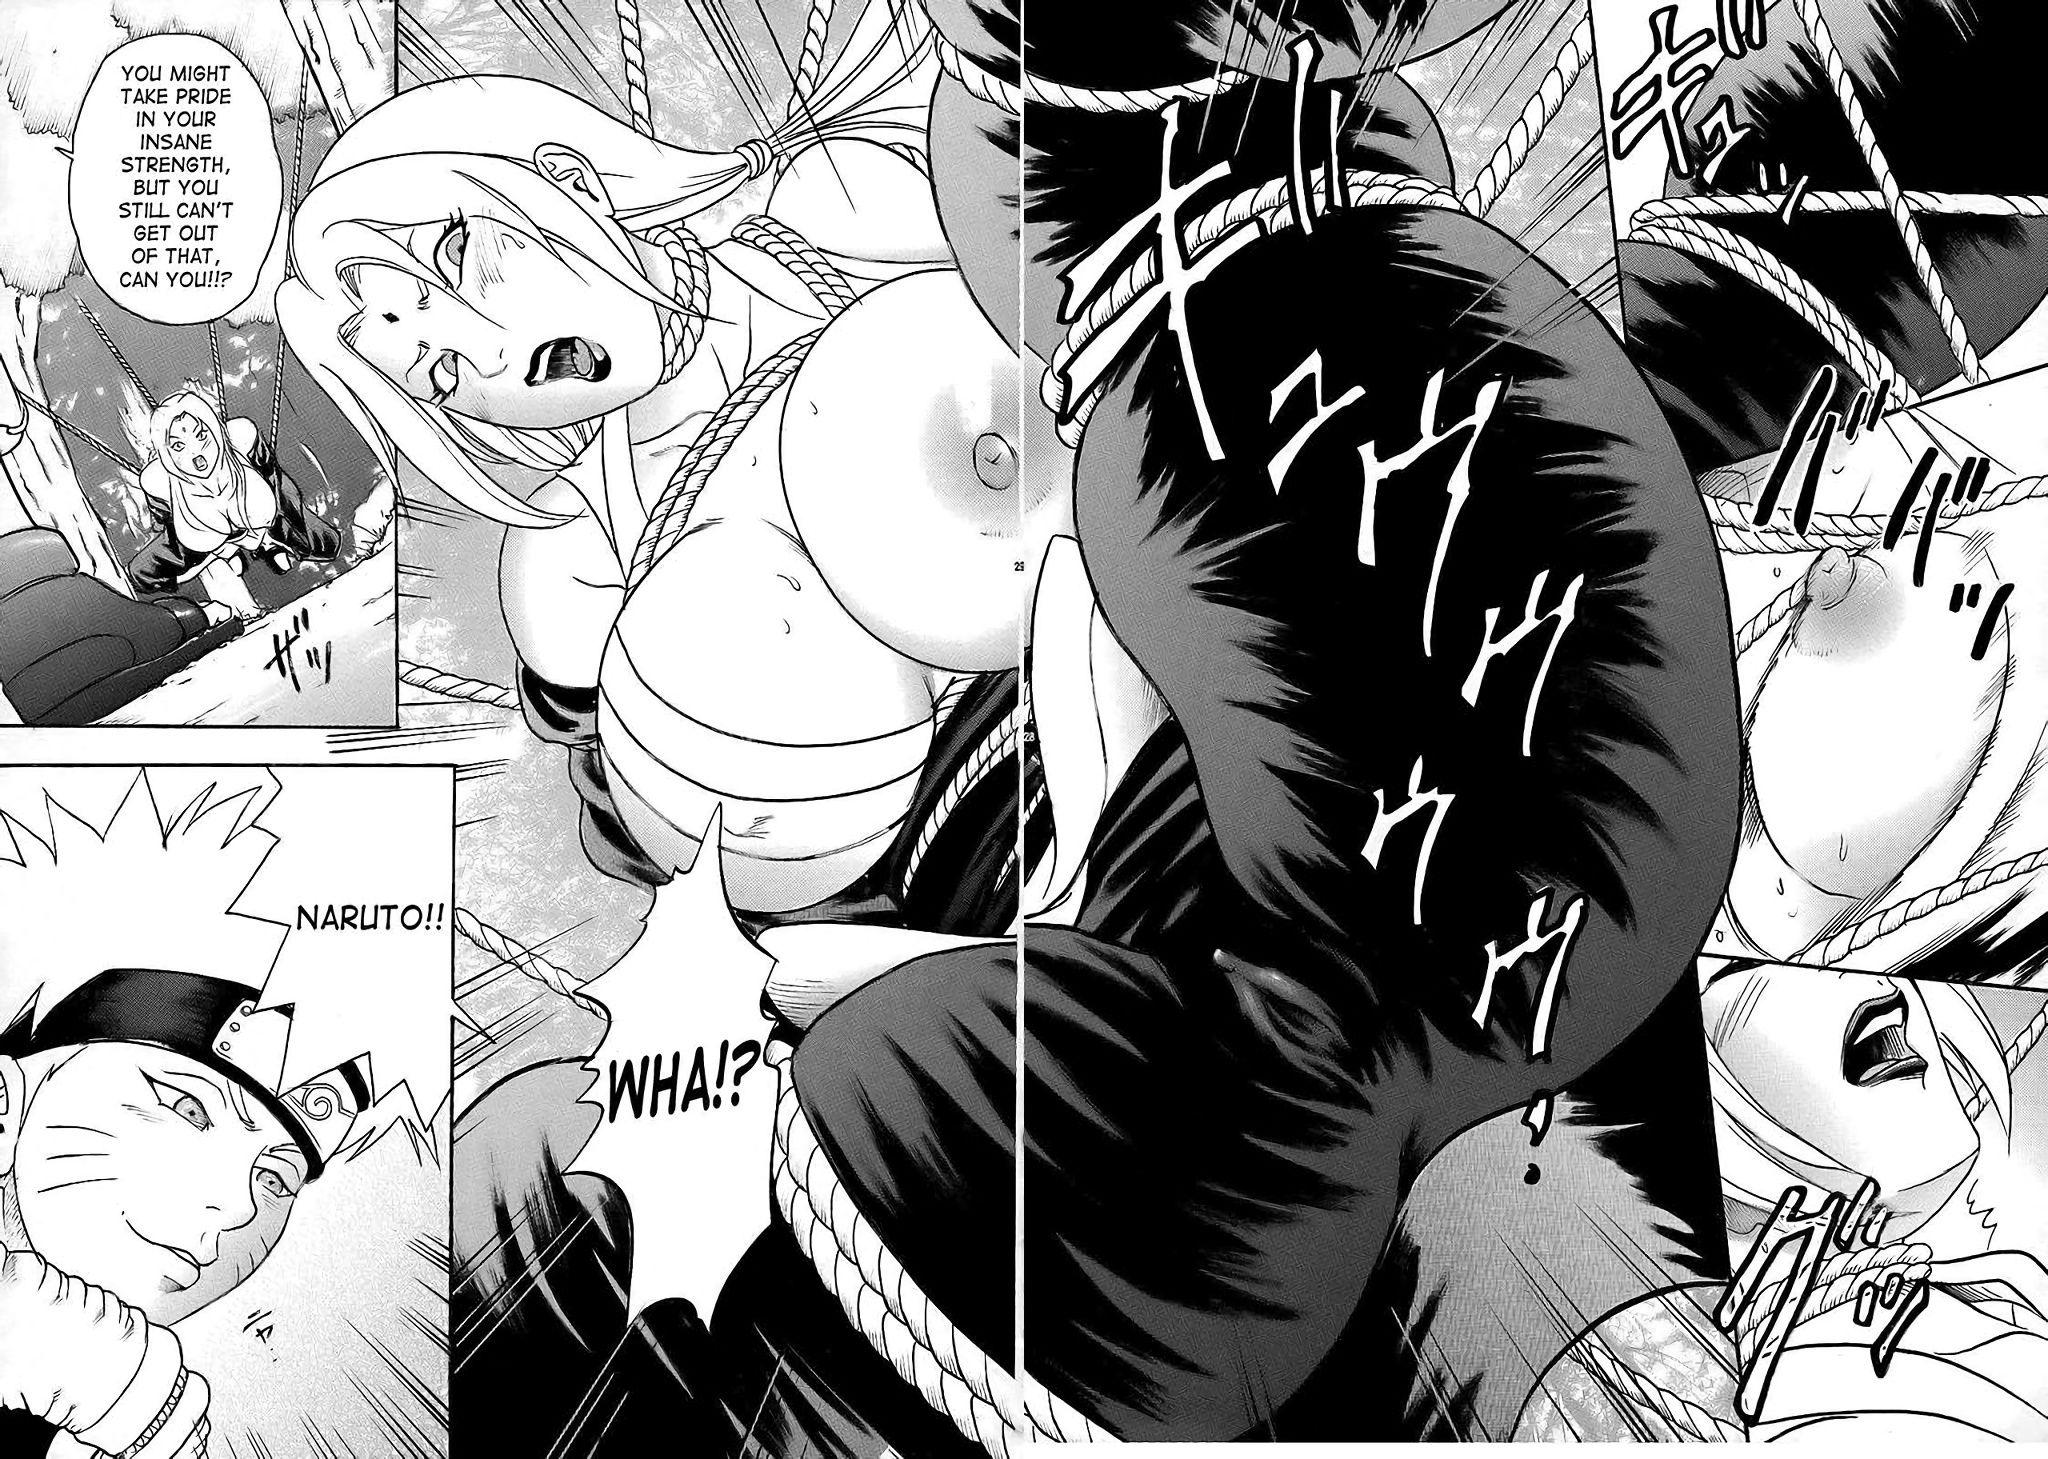 Pm 10 indecent ninja training hentai manga picture 26